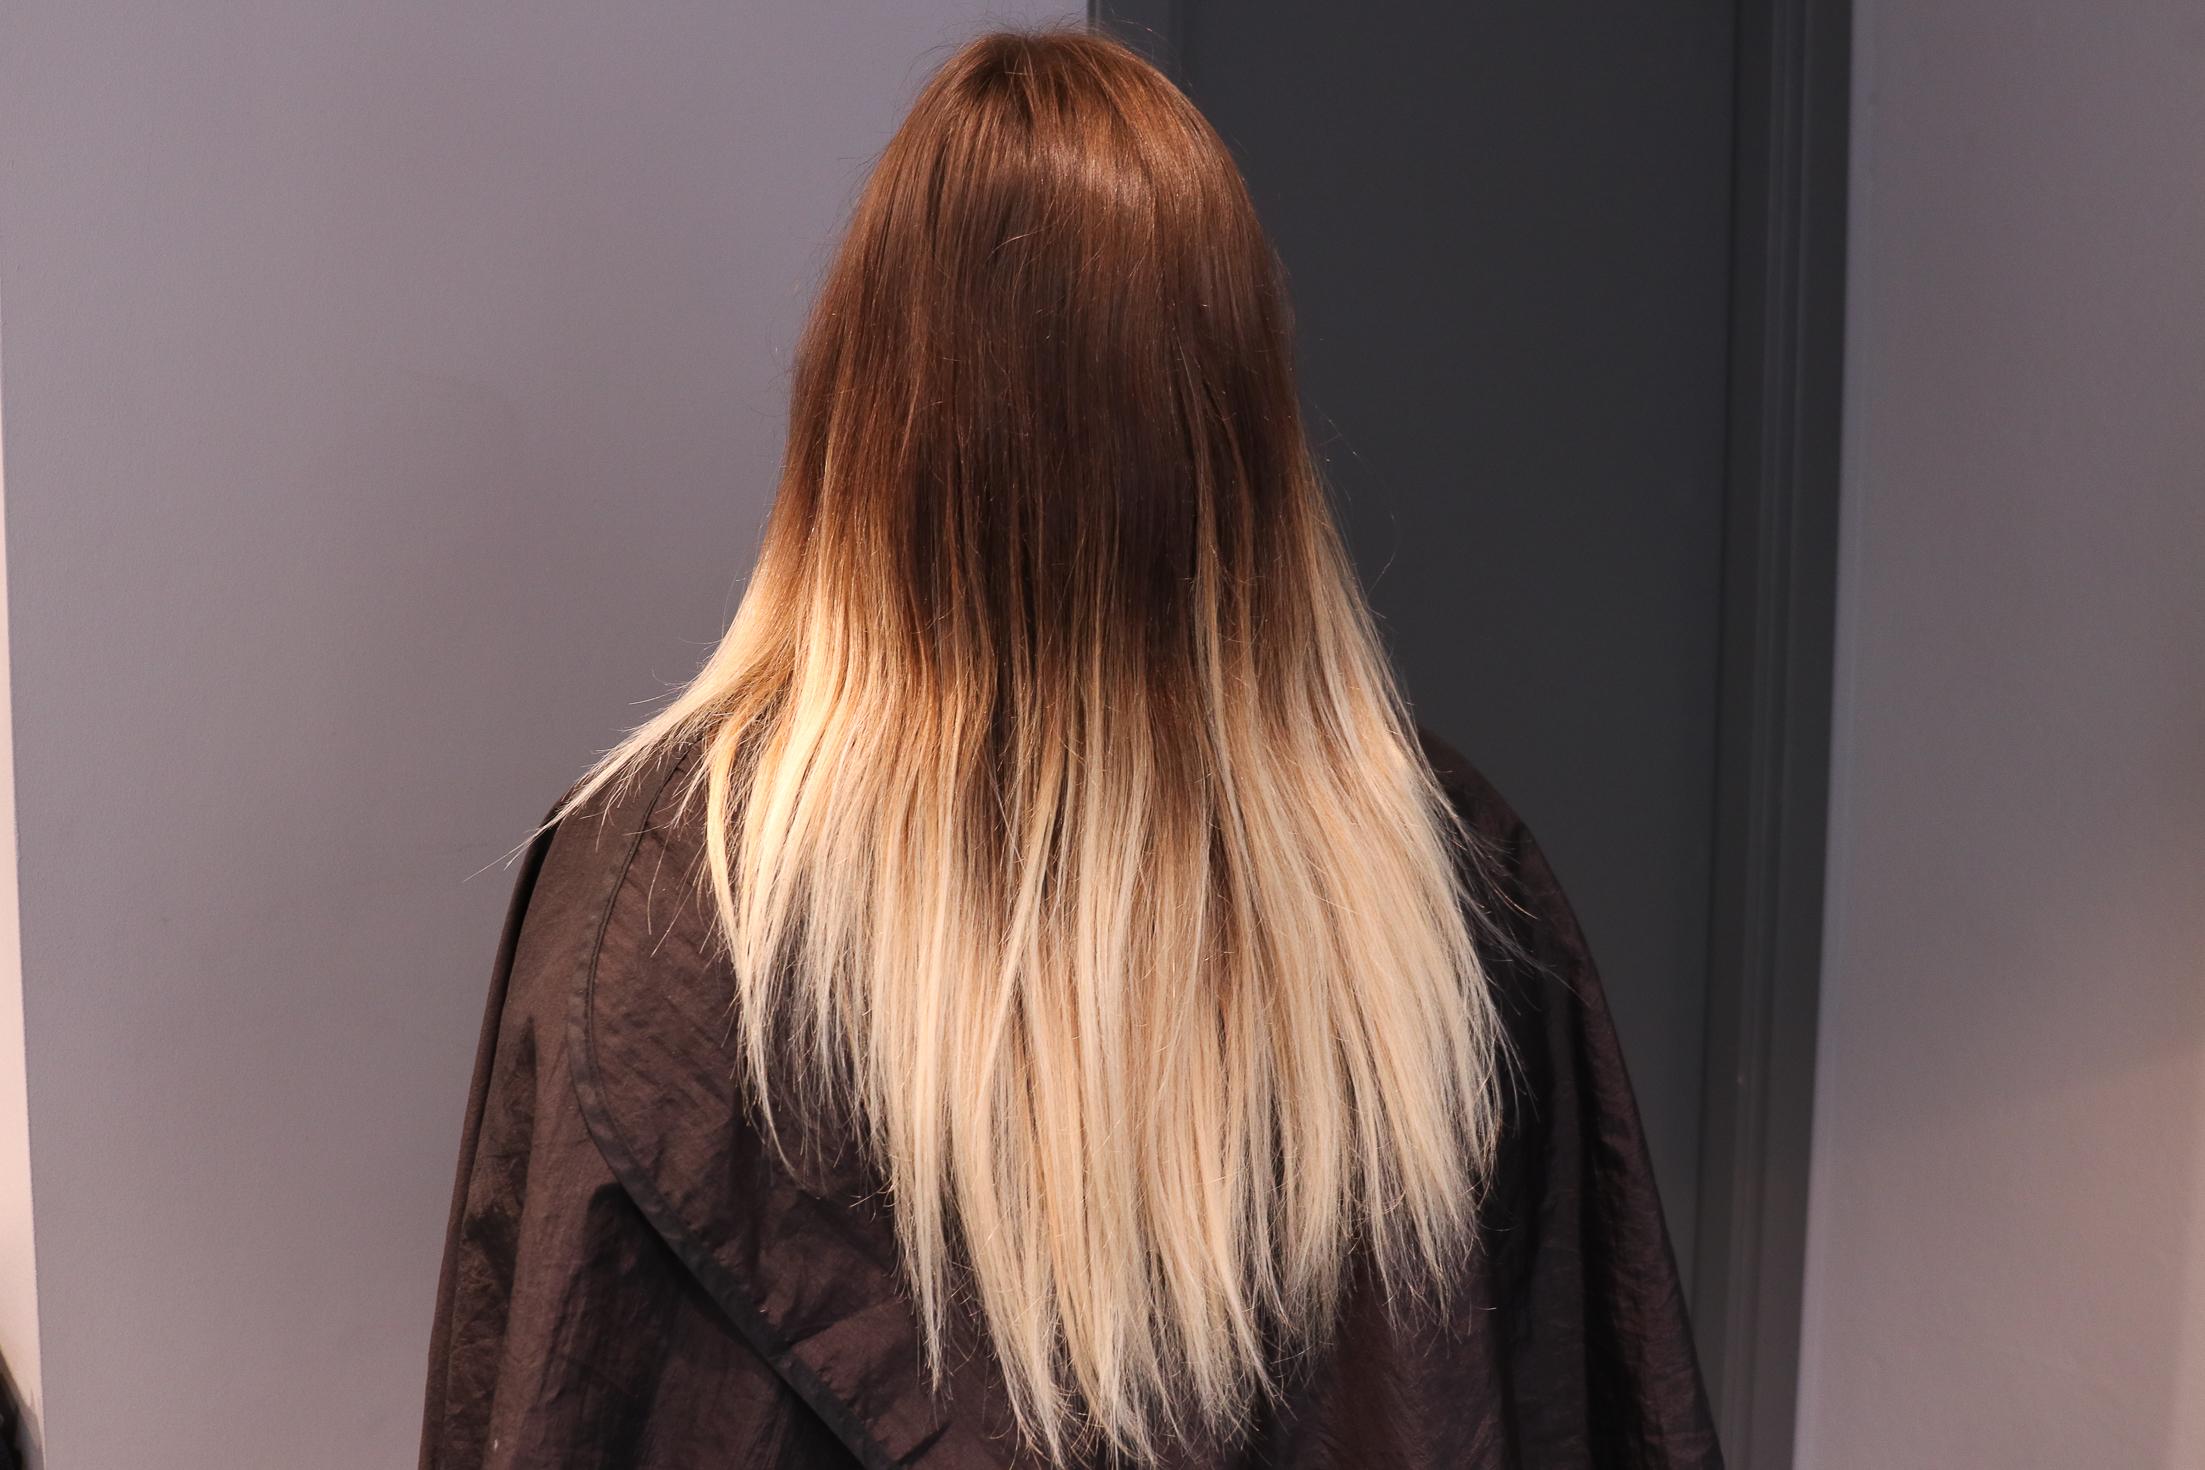 mörkt hår med grå slingor